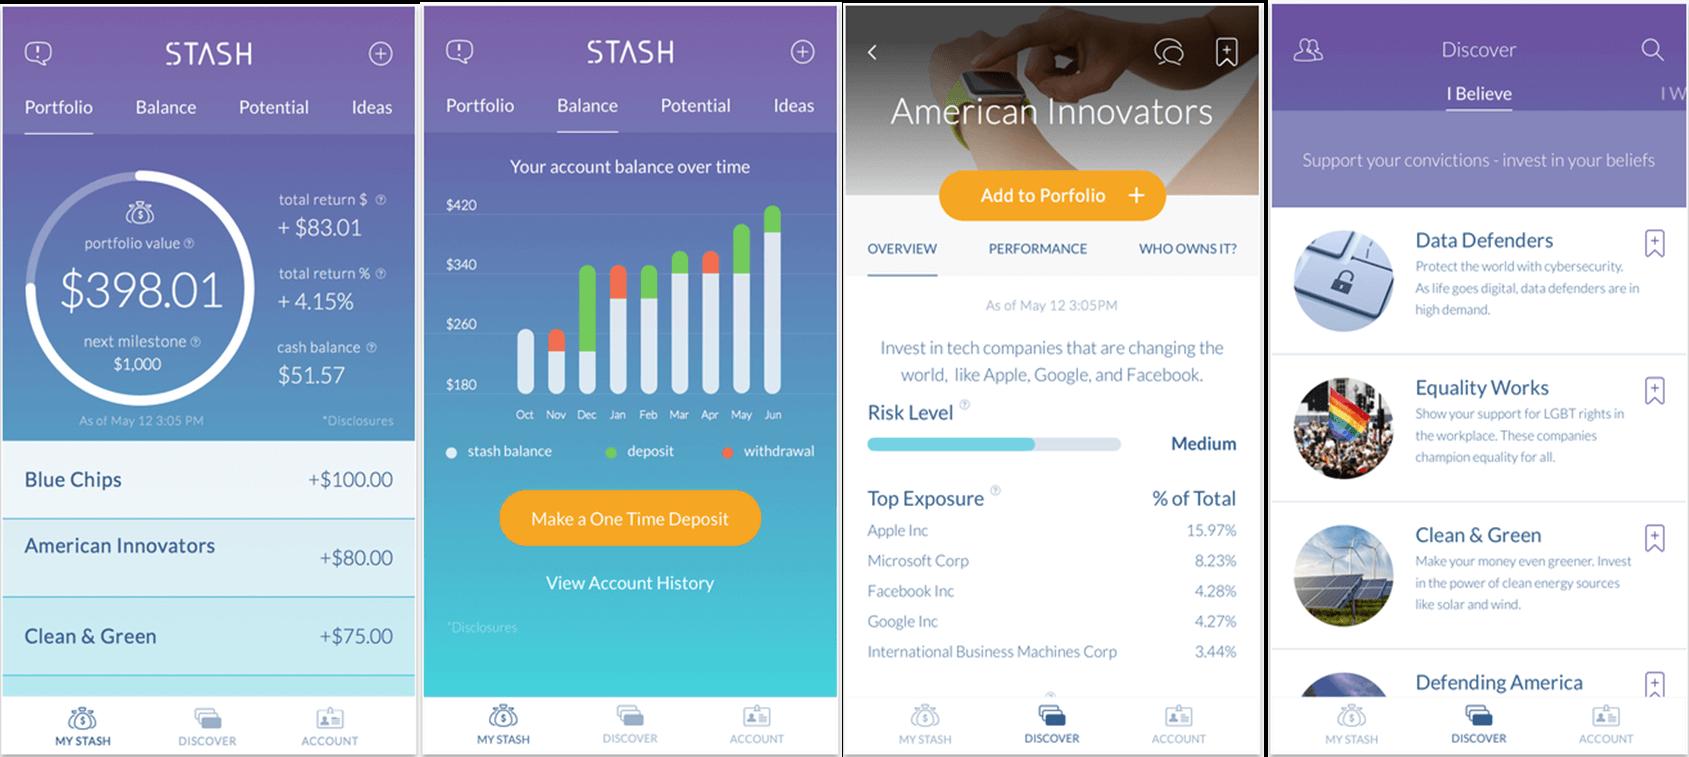 Stash cause-based investing app